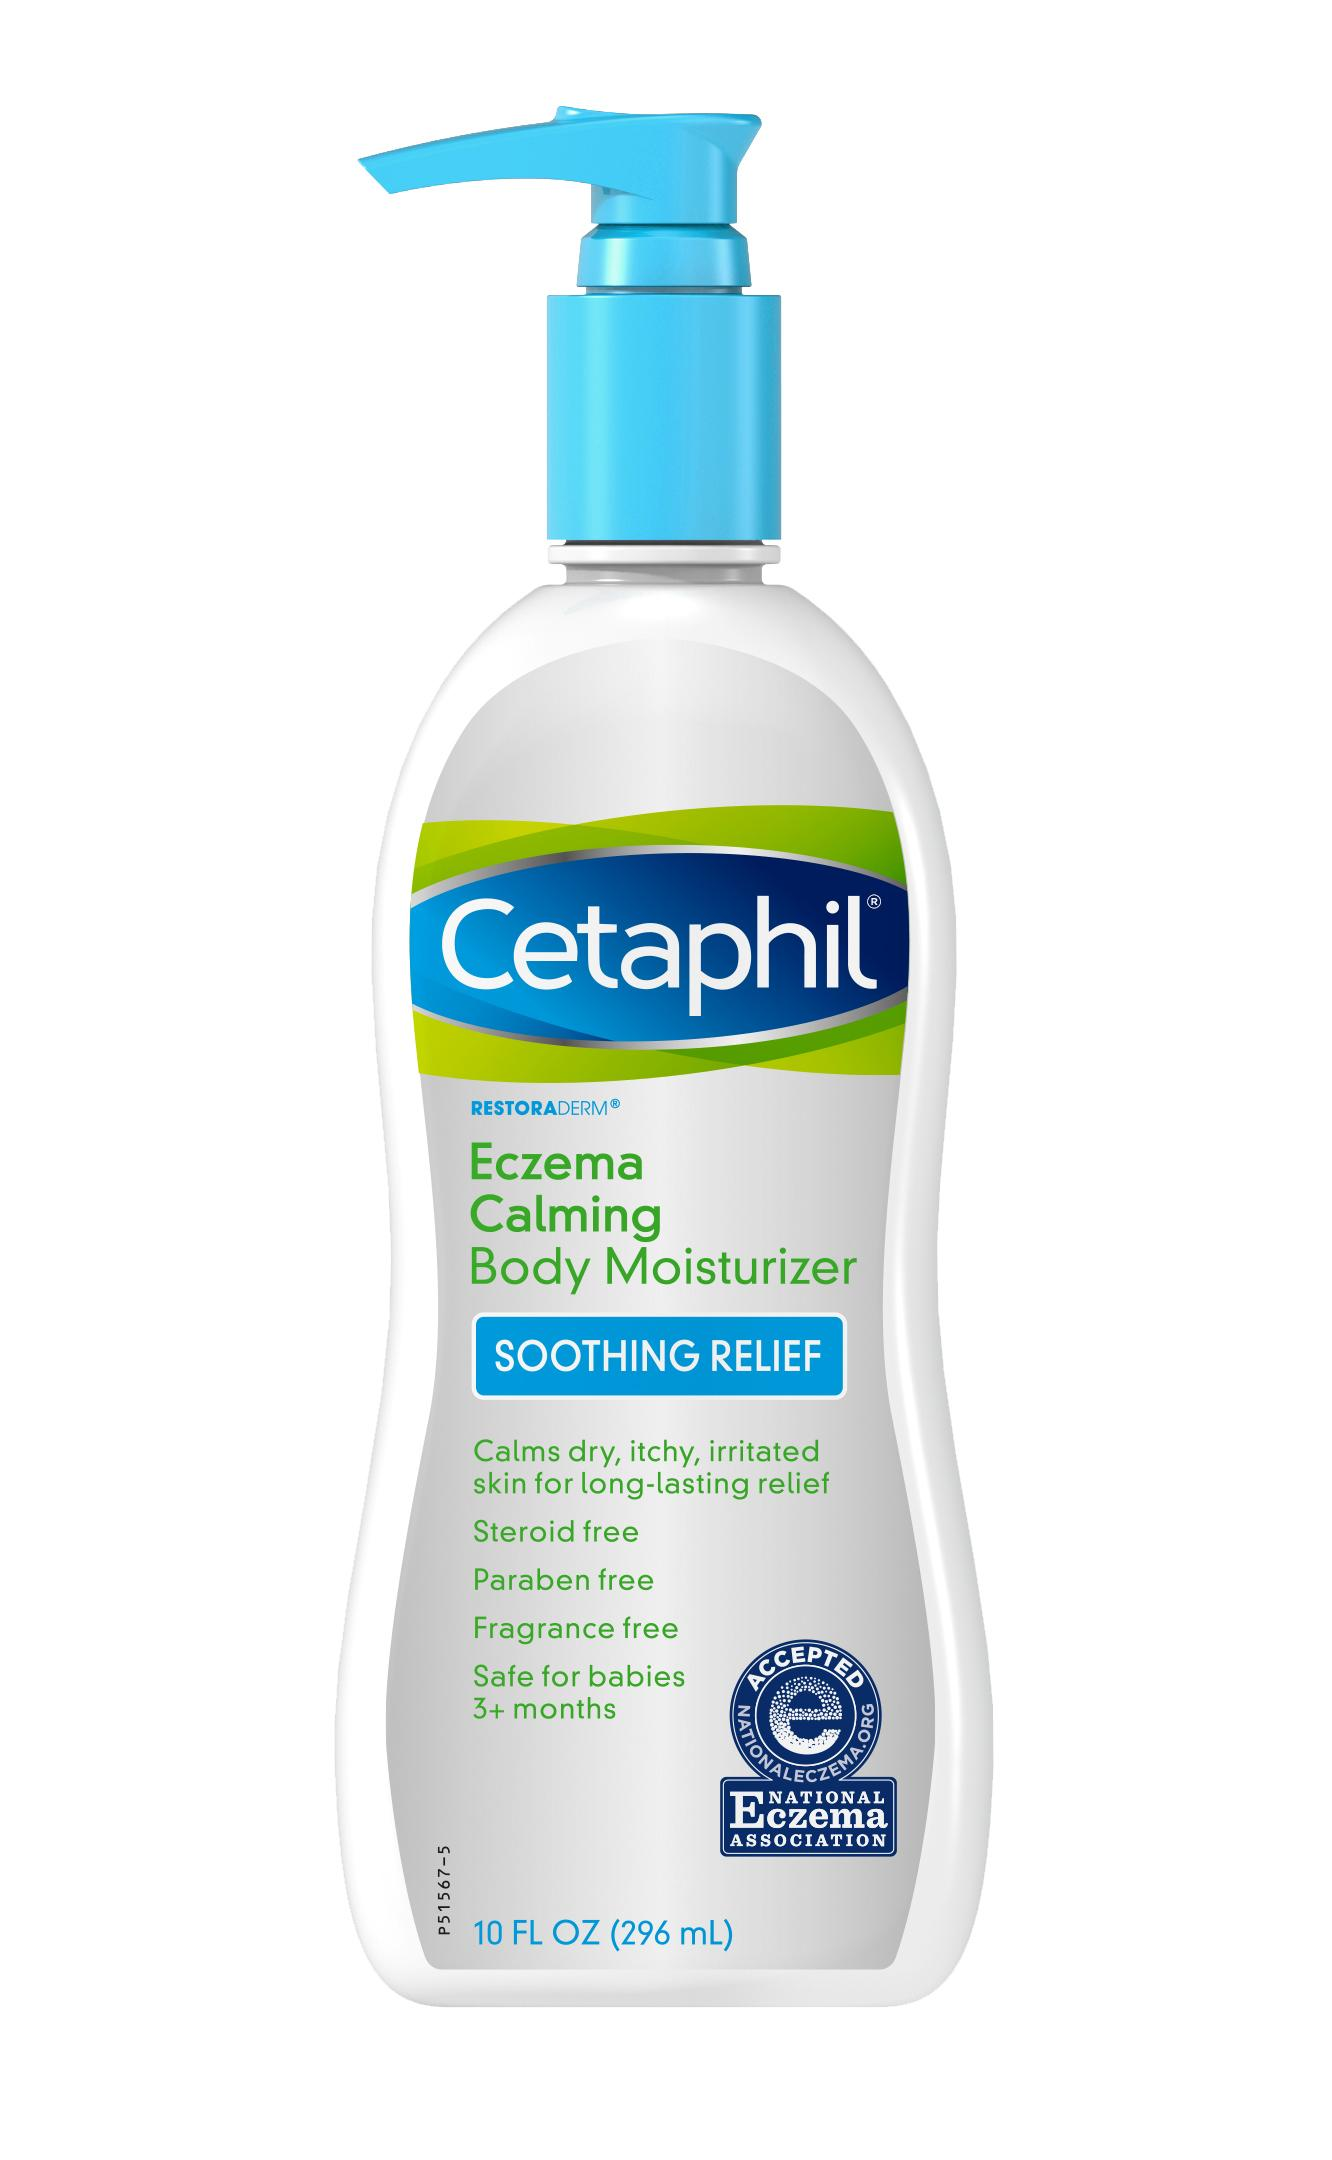 Cetaphil Restoraderm Eczema Calming End 7 28 2018 2 15 Pm